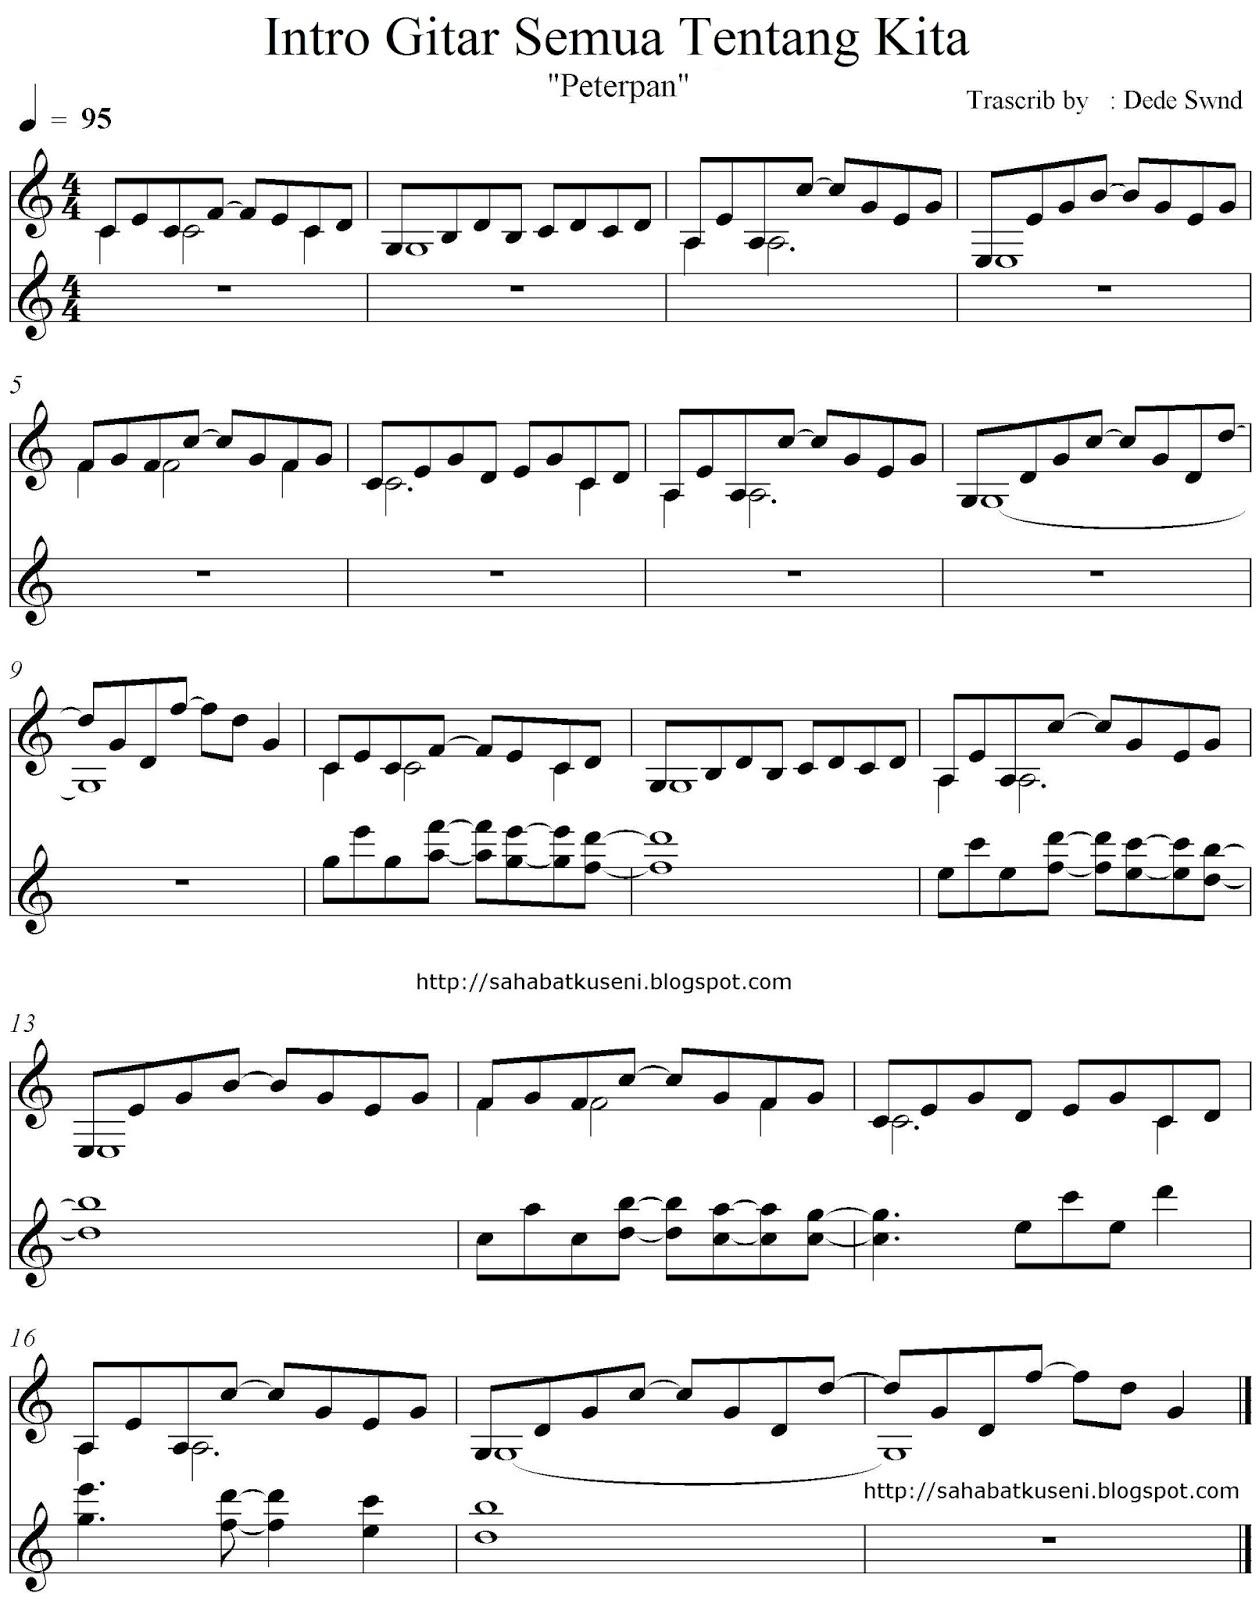 Balok Intro Gitar Lagu Semua Tentang Kita Peterpan | sahabatku seni ...